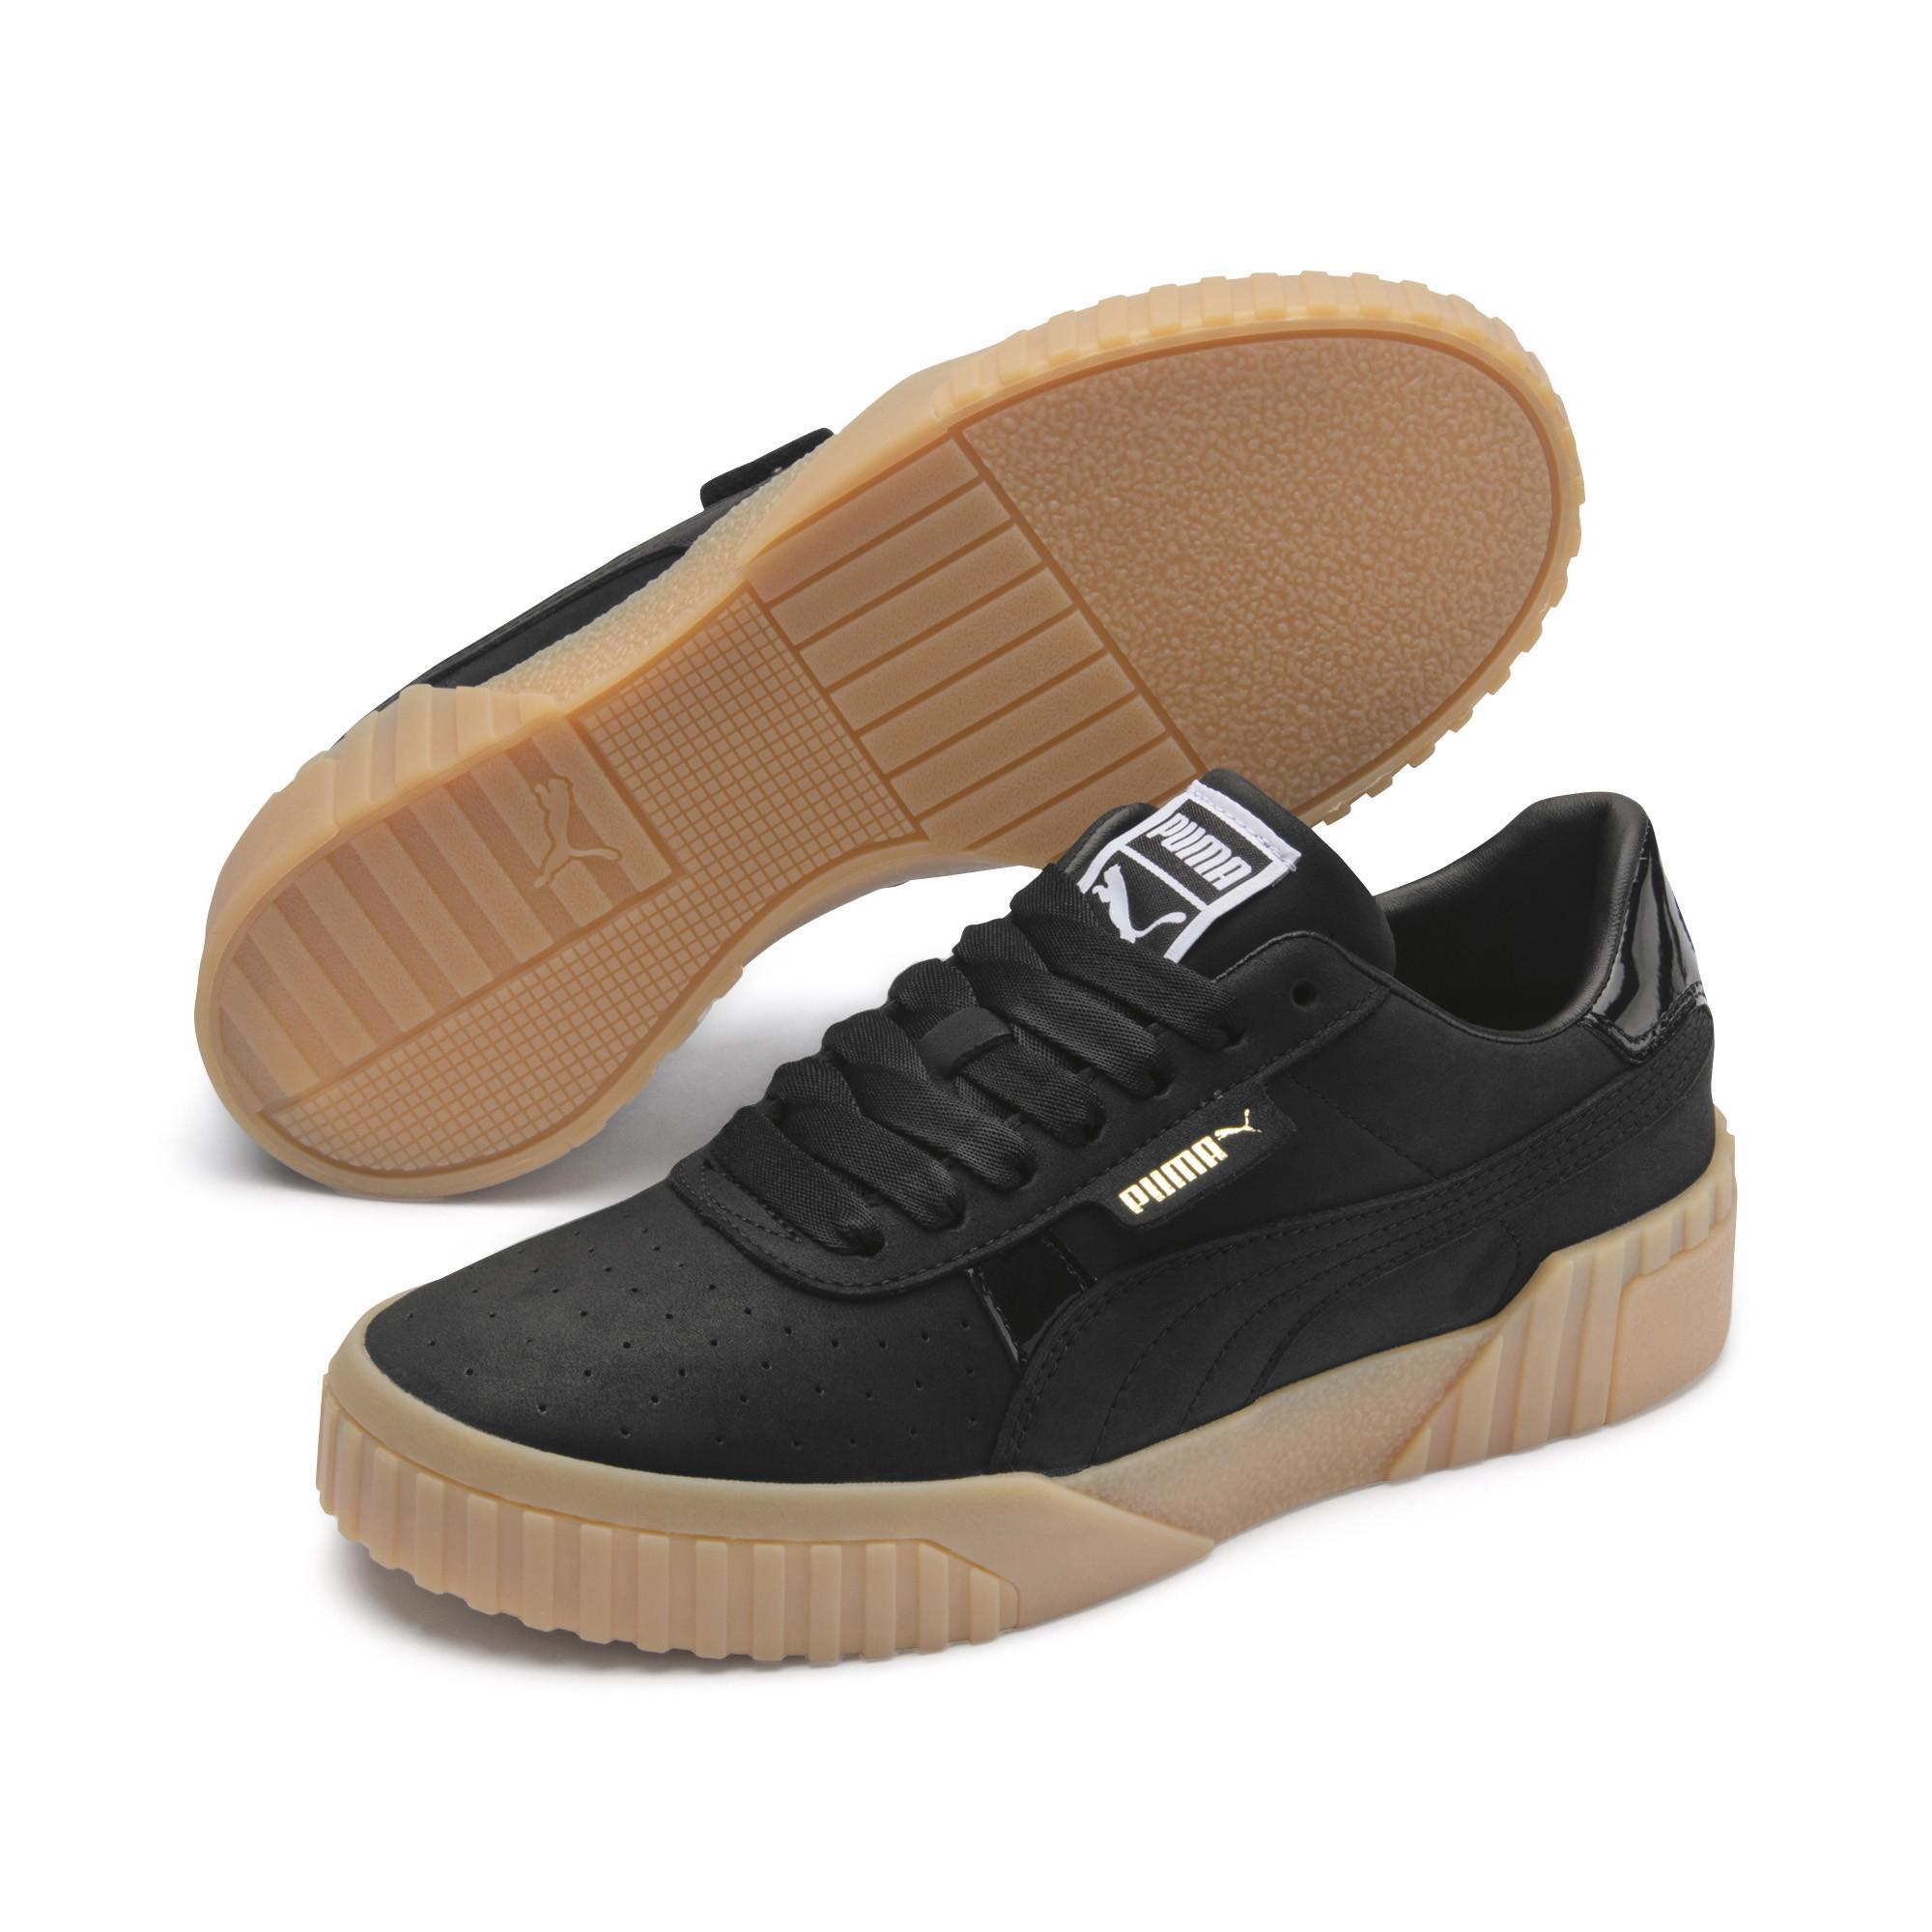 544ede4c2fa8 PUMA - Black Cali Nubuck Women s Sneakers - Lyst. View fullscreen